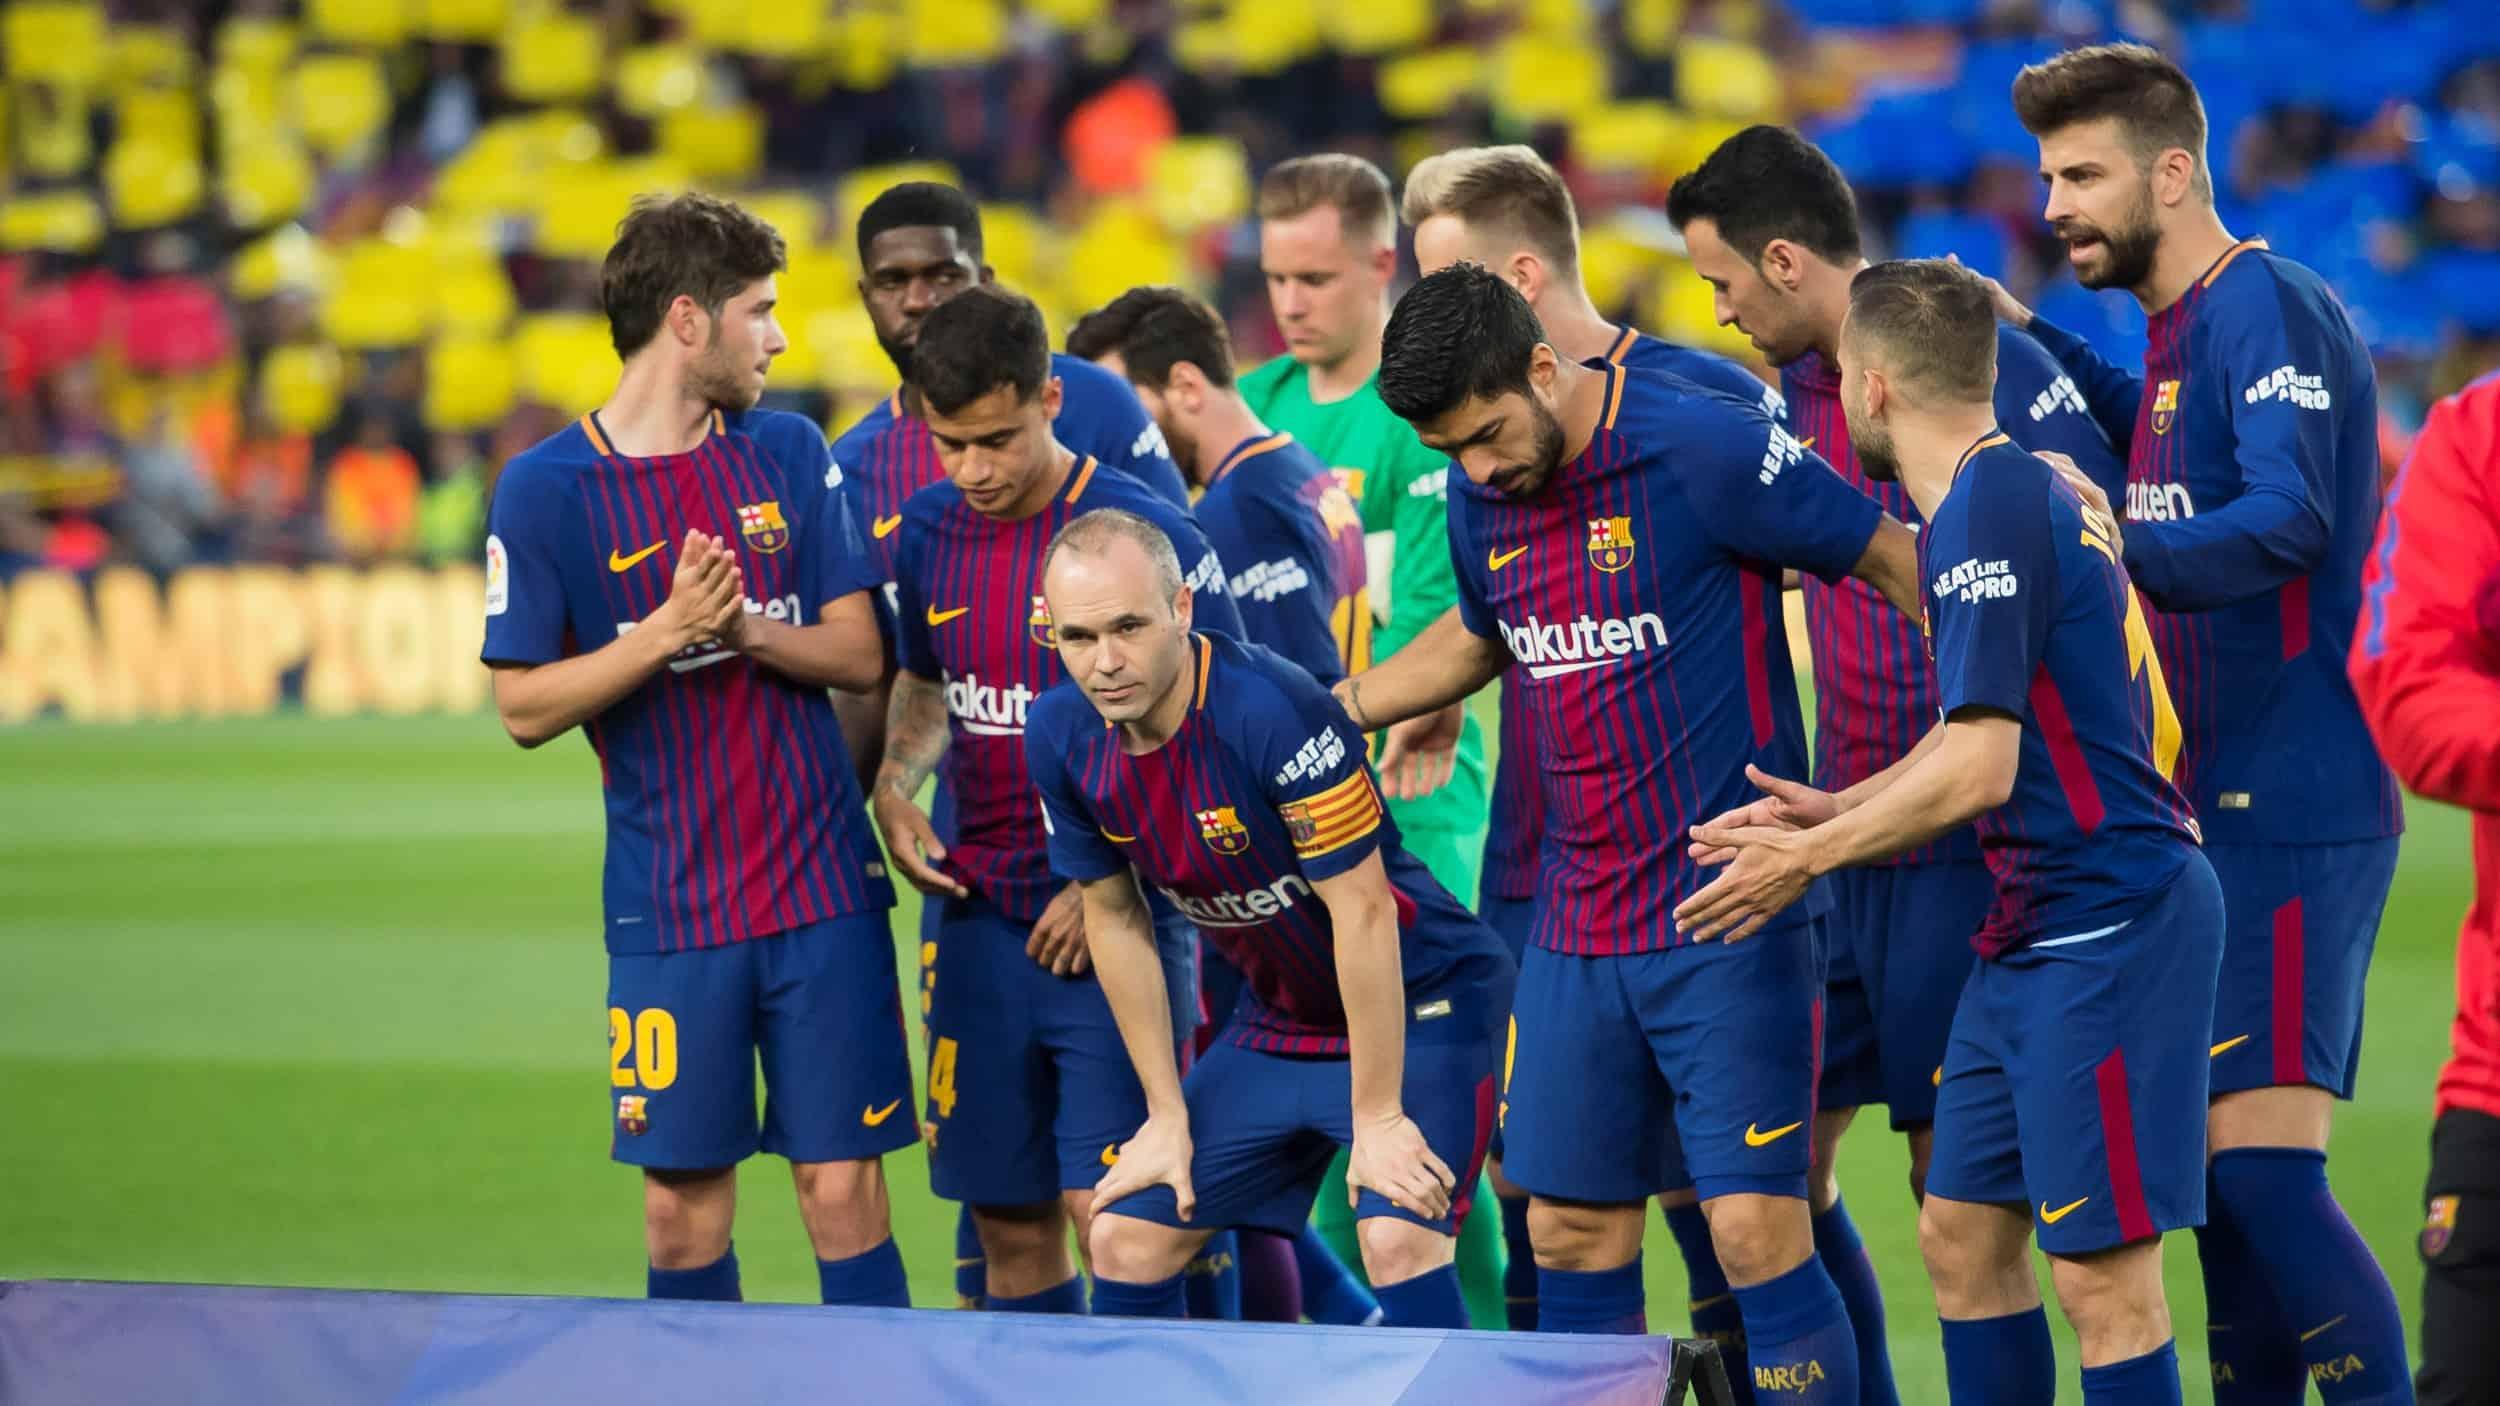 2018-05-06_FCB vs MADRID_VICTOR